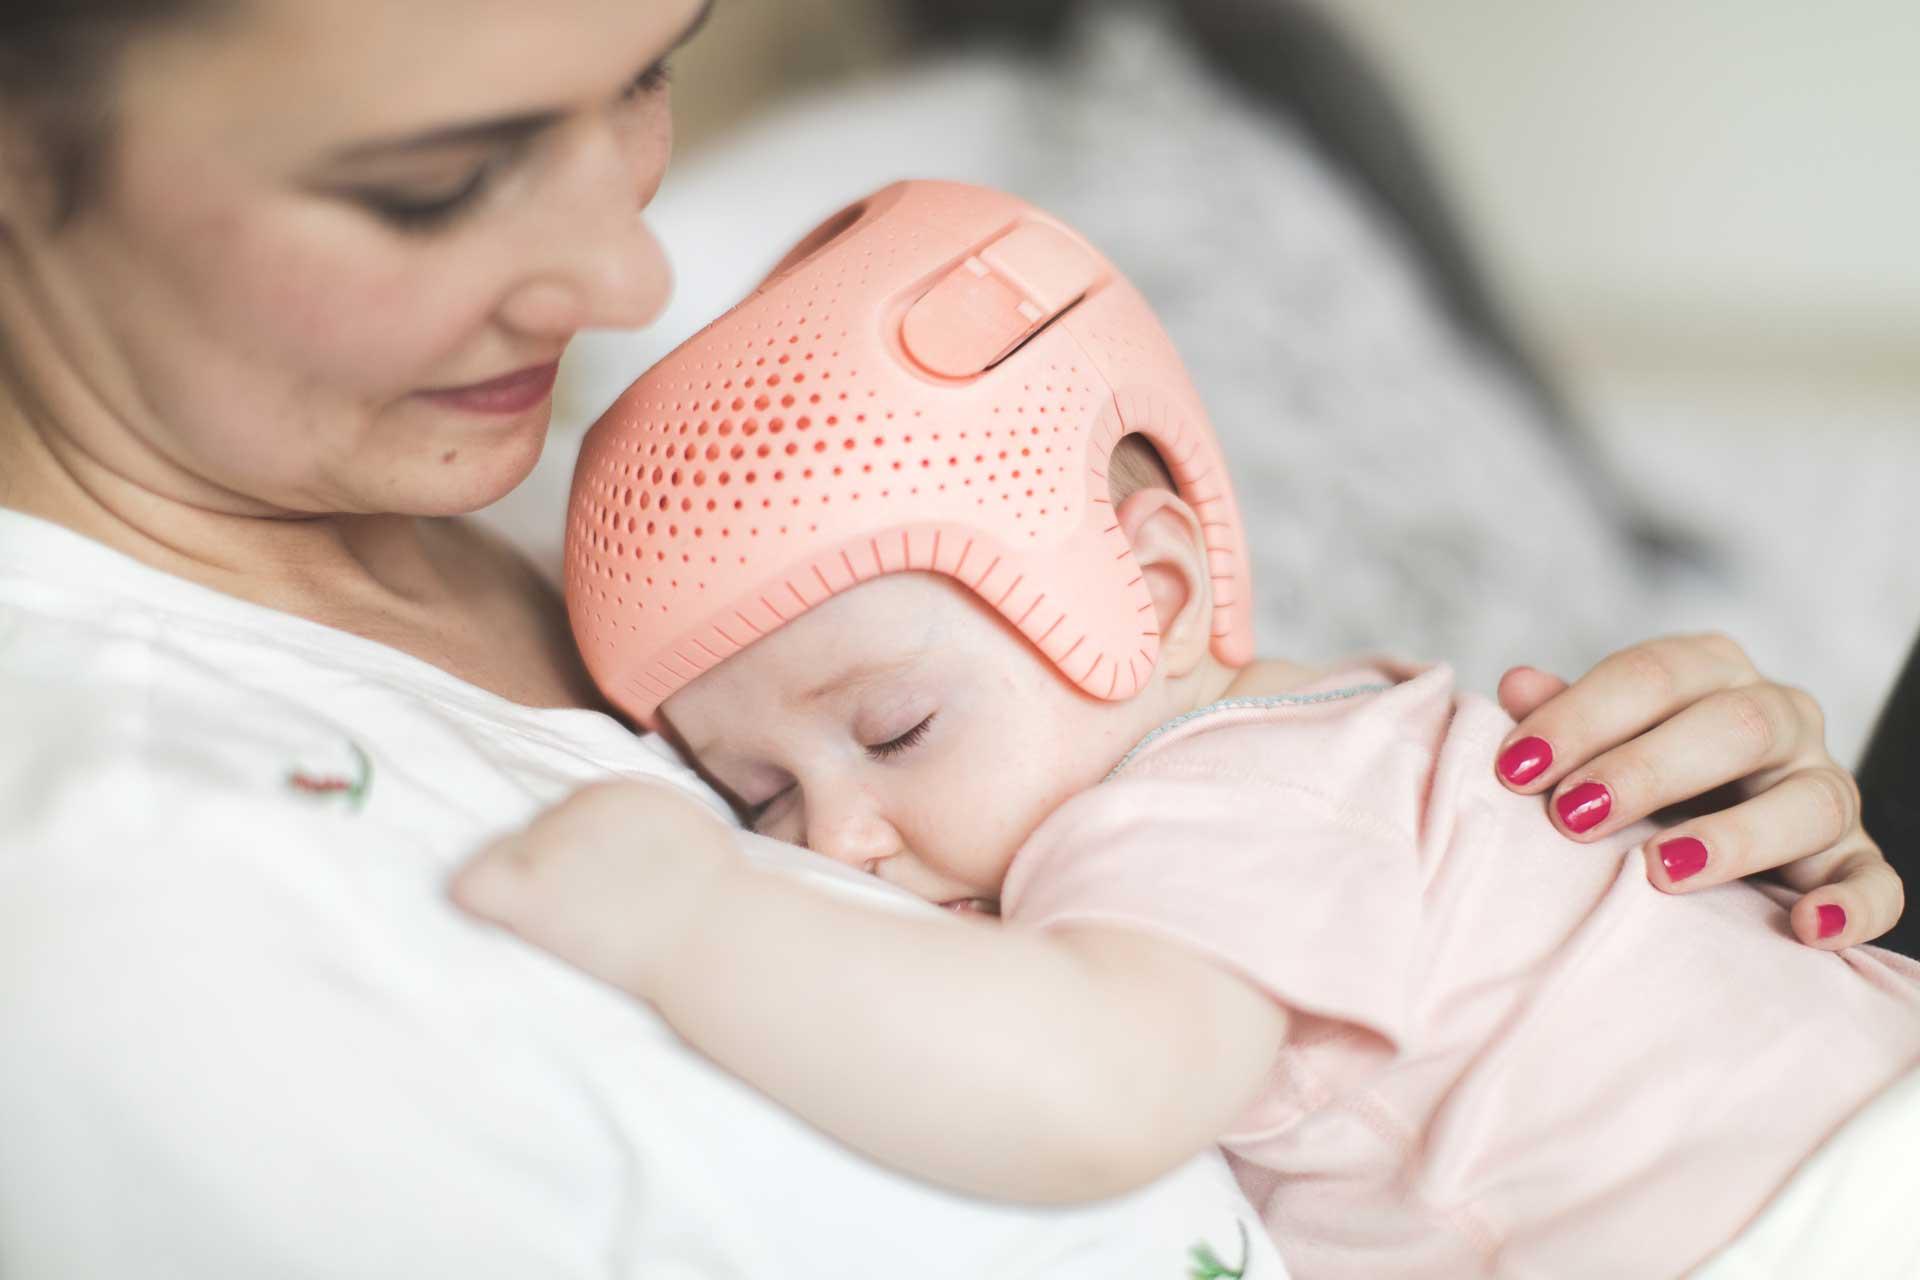 plagiocephaly helmet baby pink